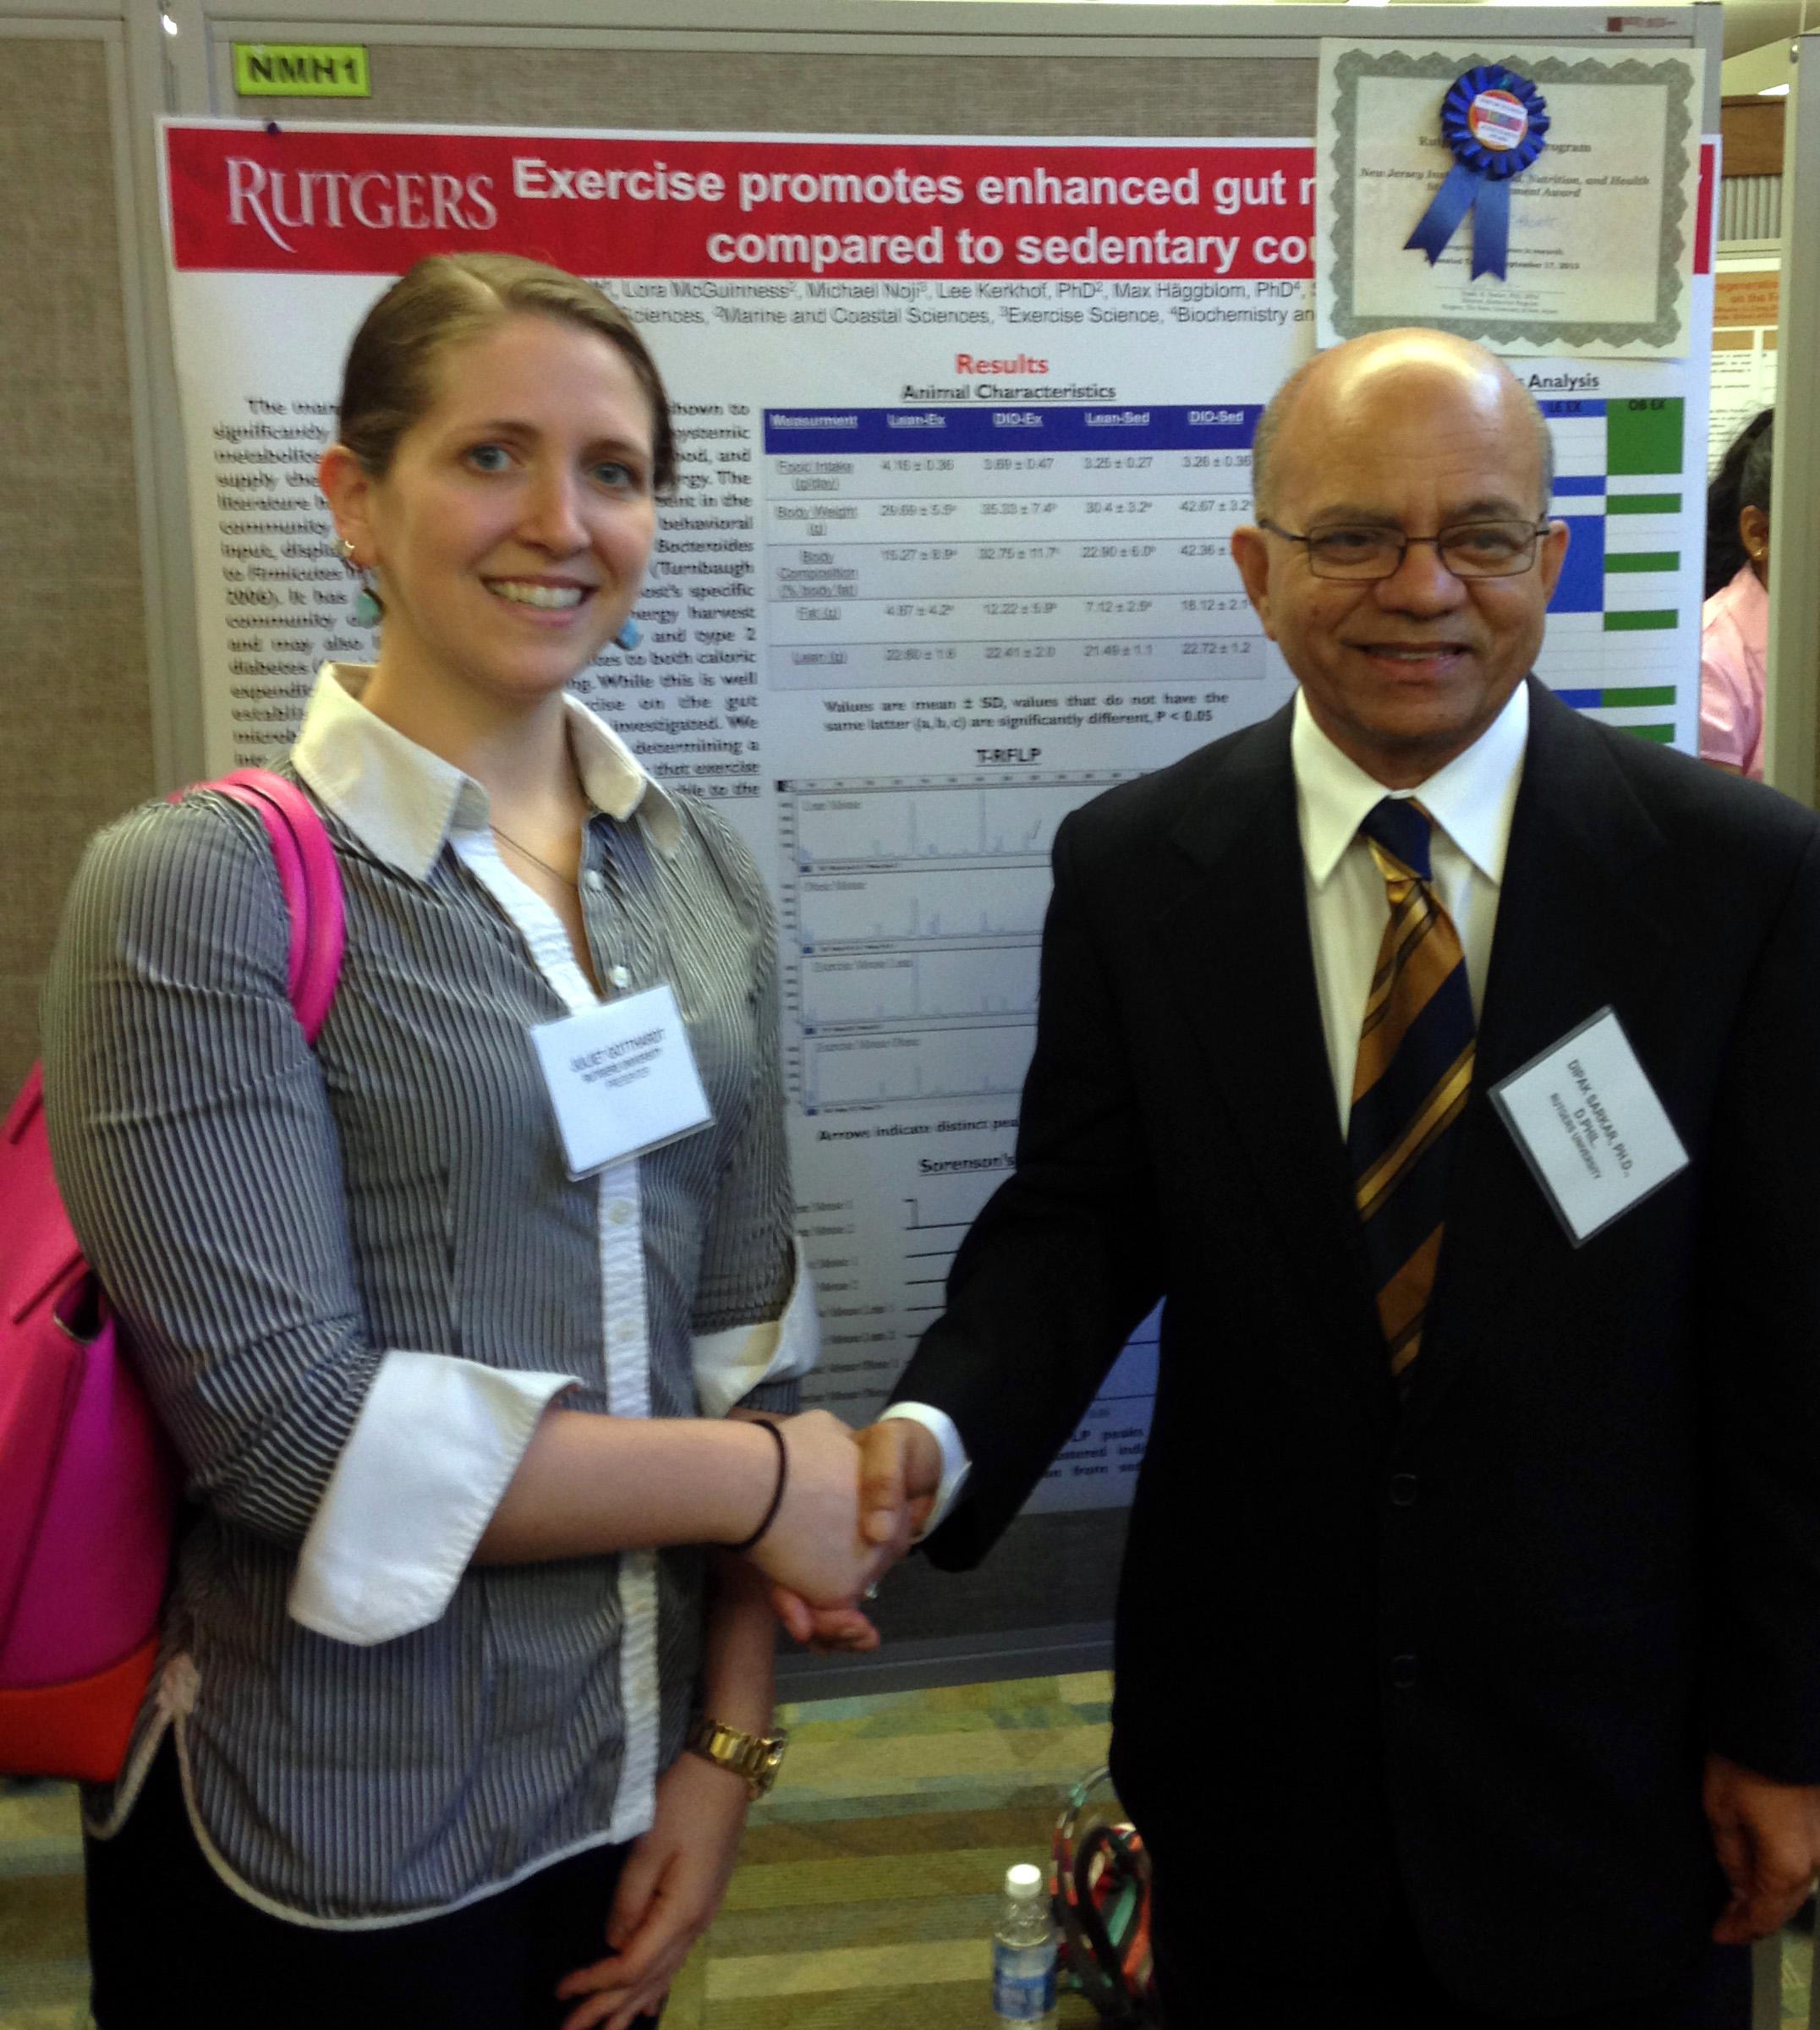 6th Annual Pioneers in Endocrinology Workshop